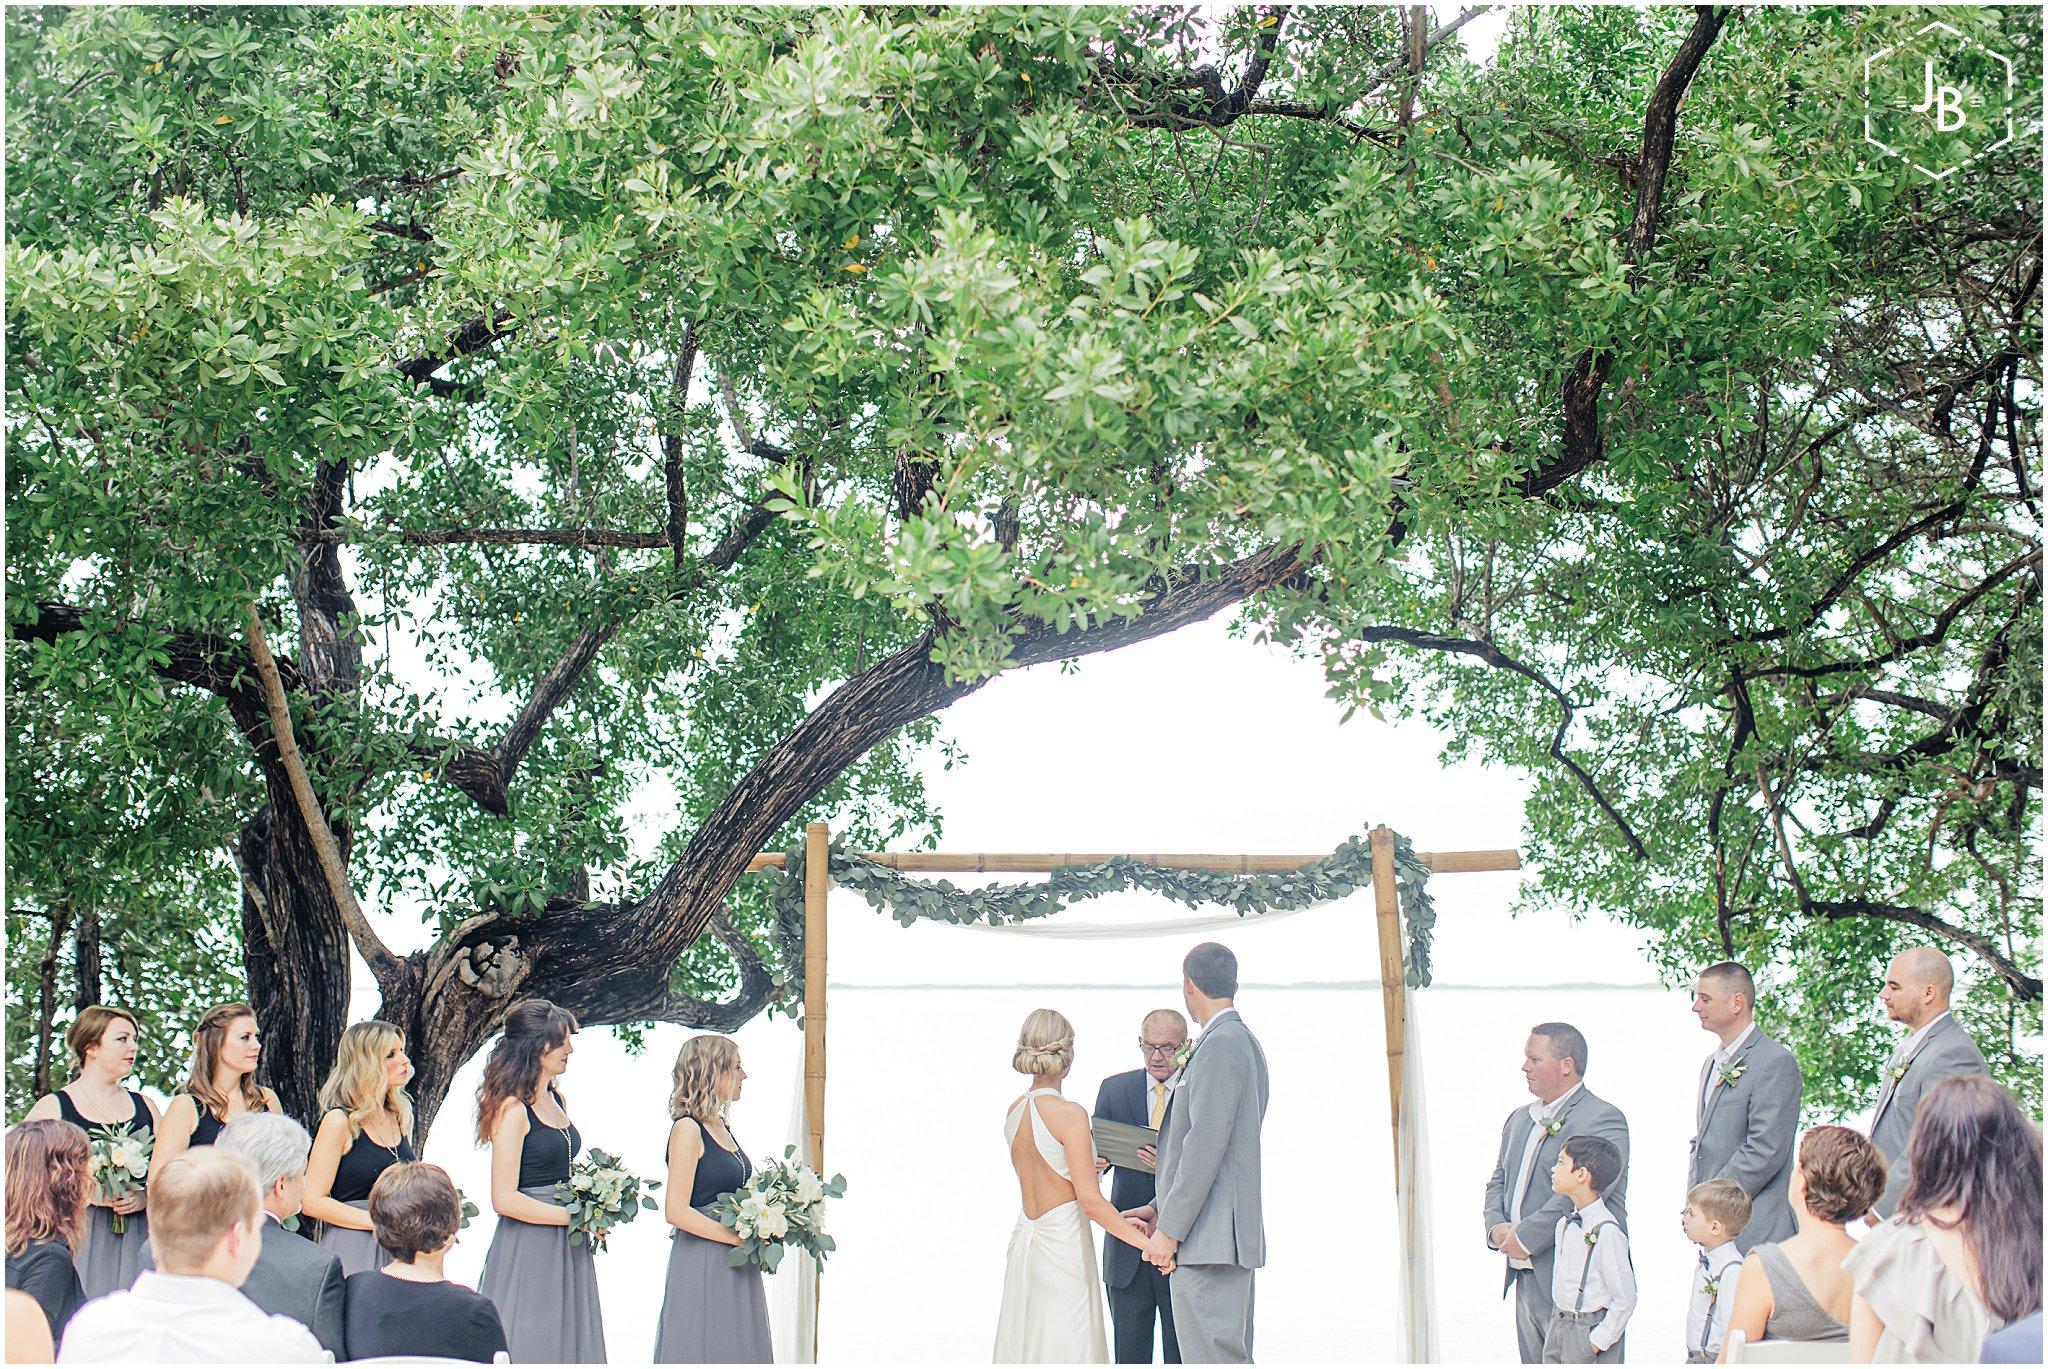 WeddingandEngagementFloridaPhotographer_1127.jpg